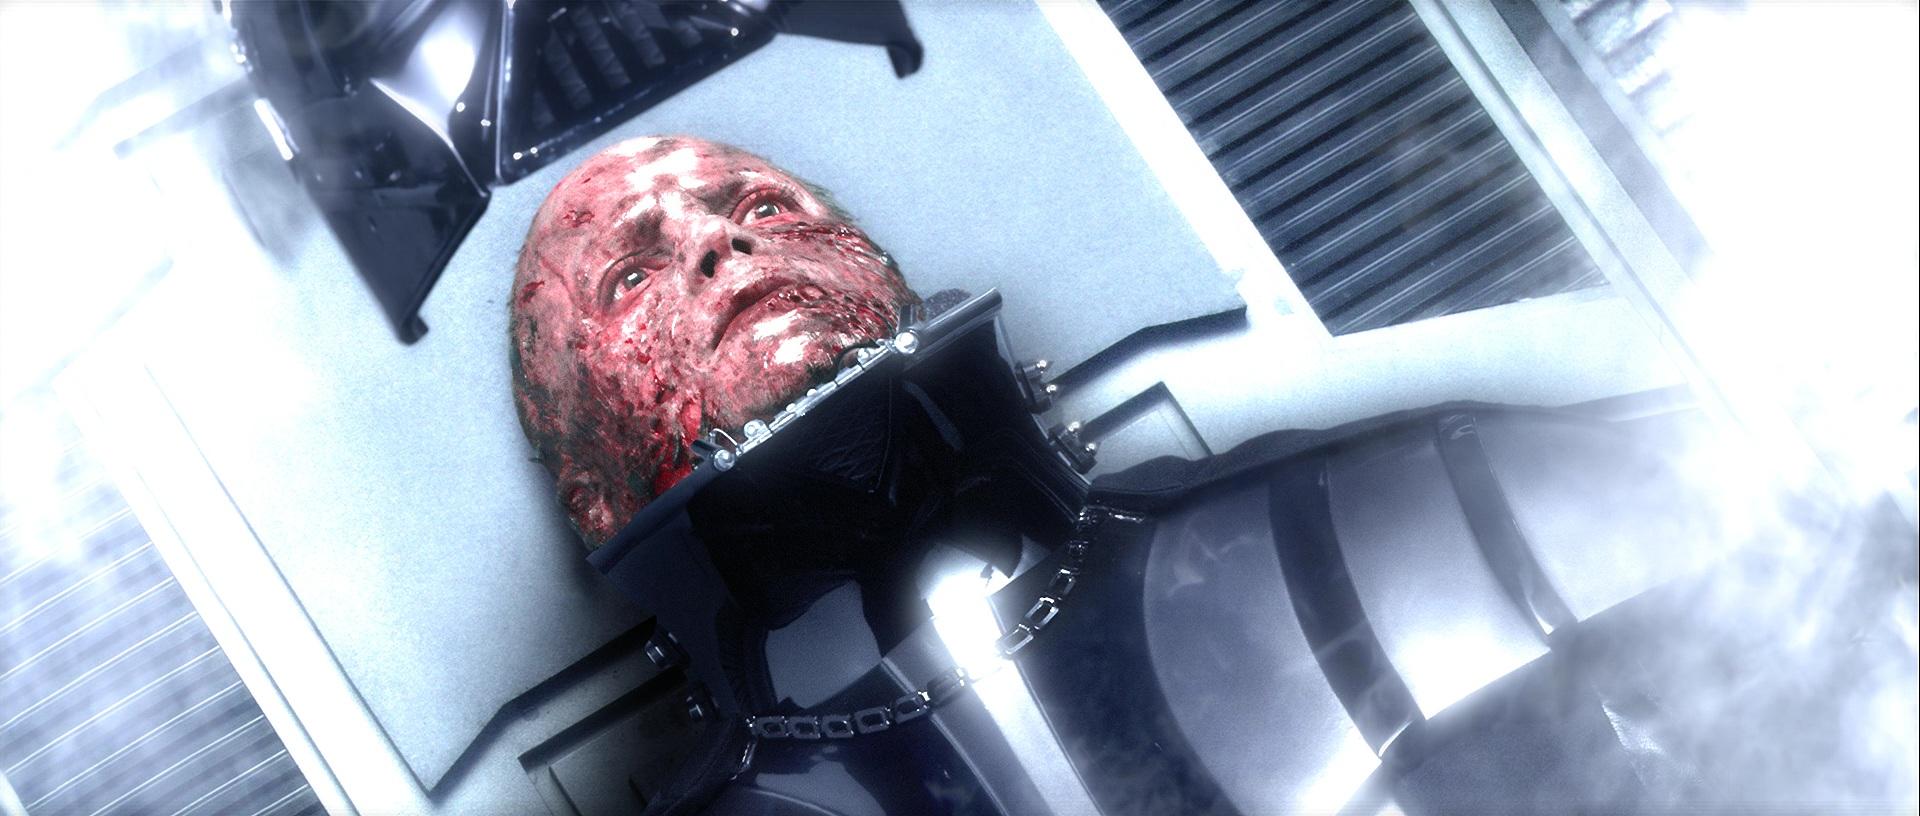 The Darth Vader helmet is put on Anakin's head in Star Wars: Episode III -- Revenge of the Sith